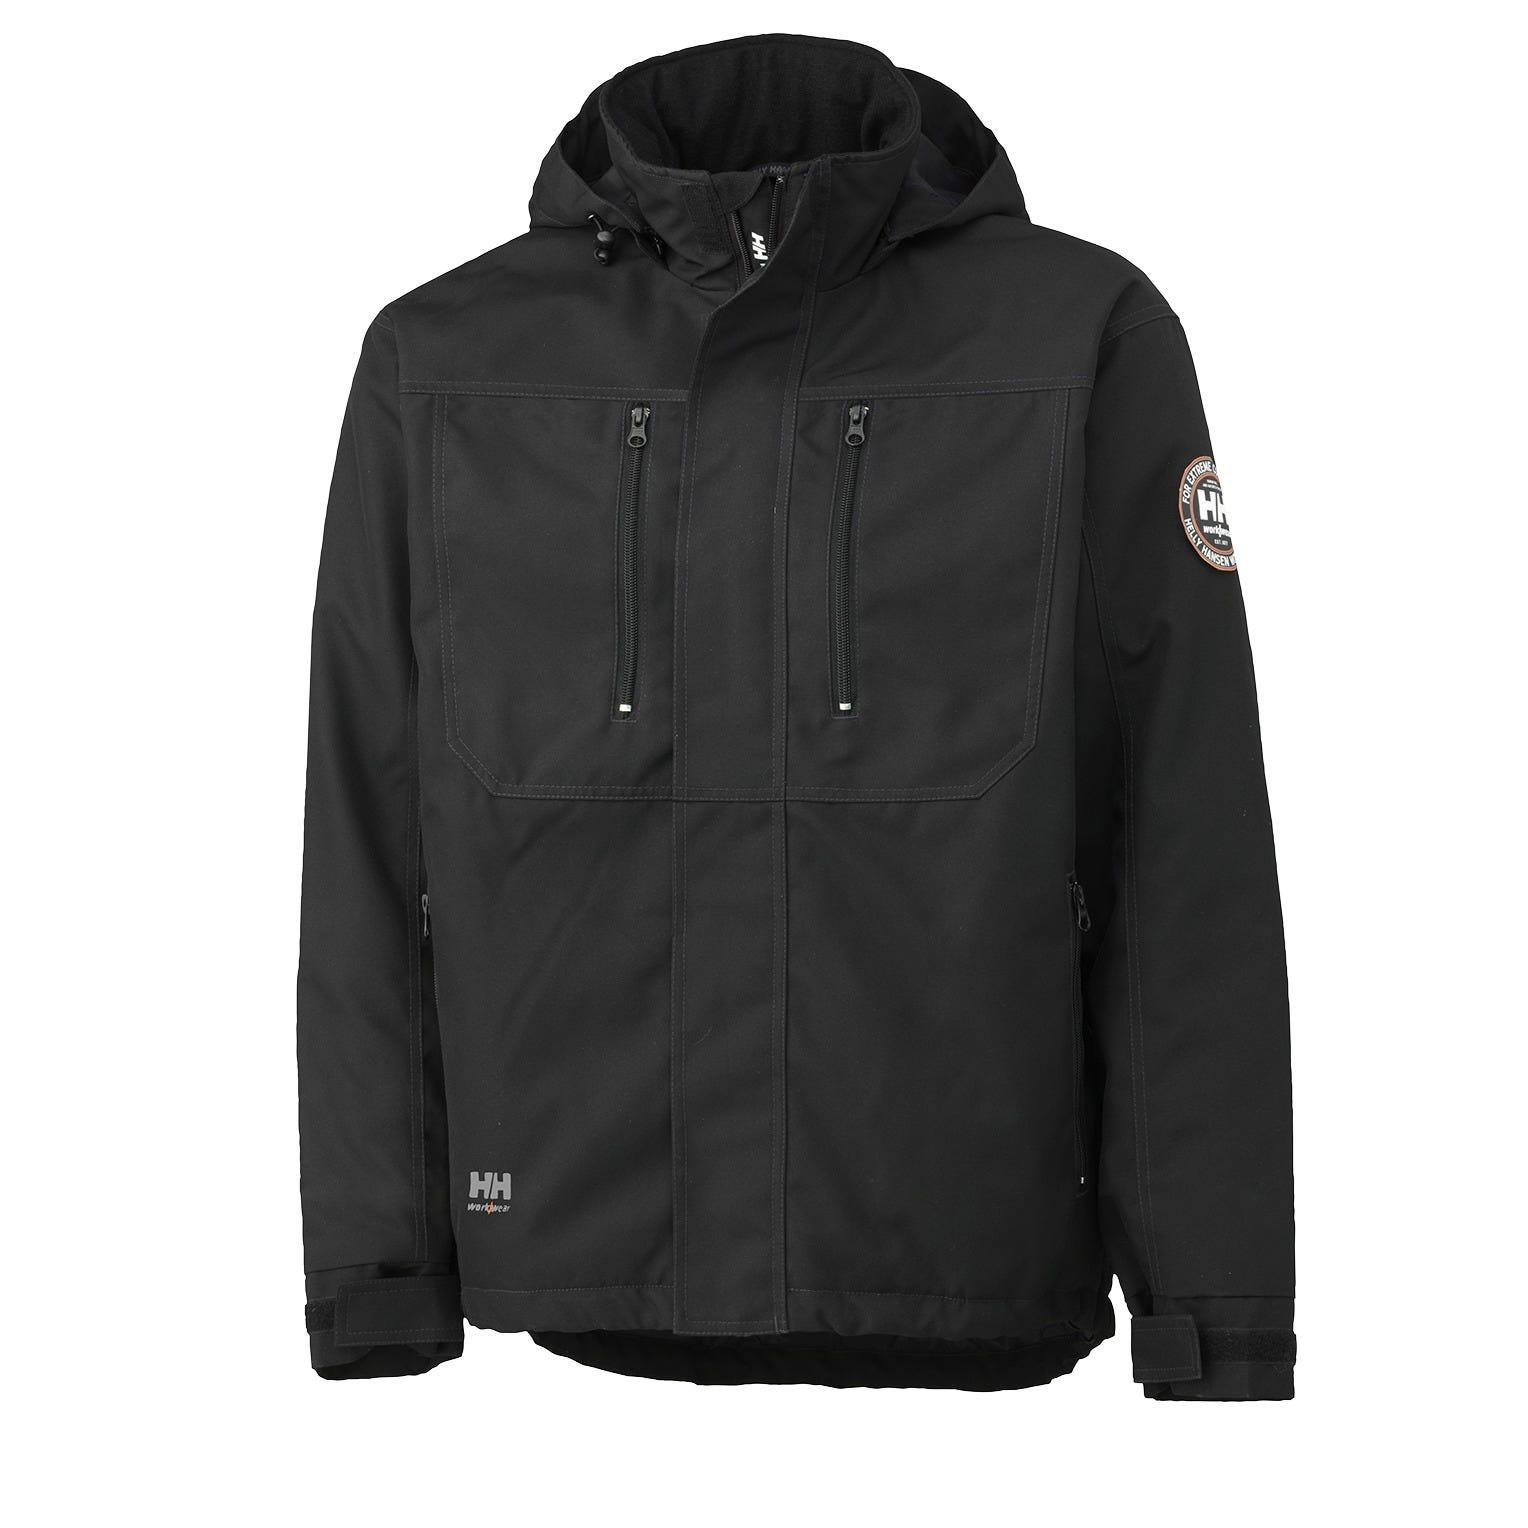 HH Workwear Workwear Berg Insulated Winter Jacket Black L